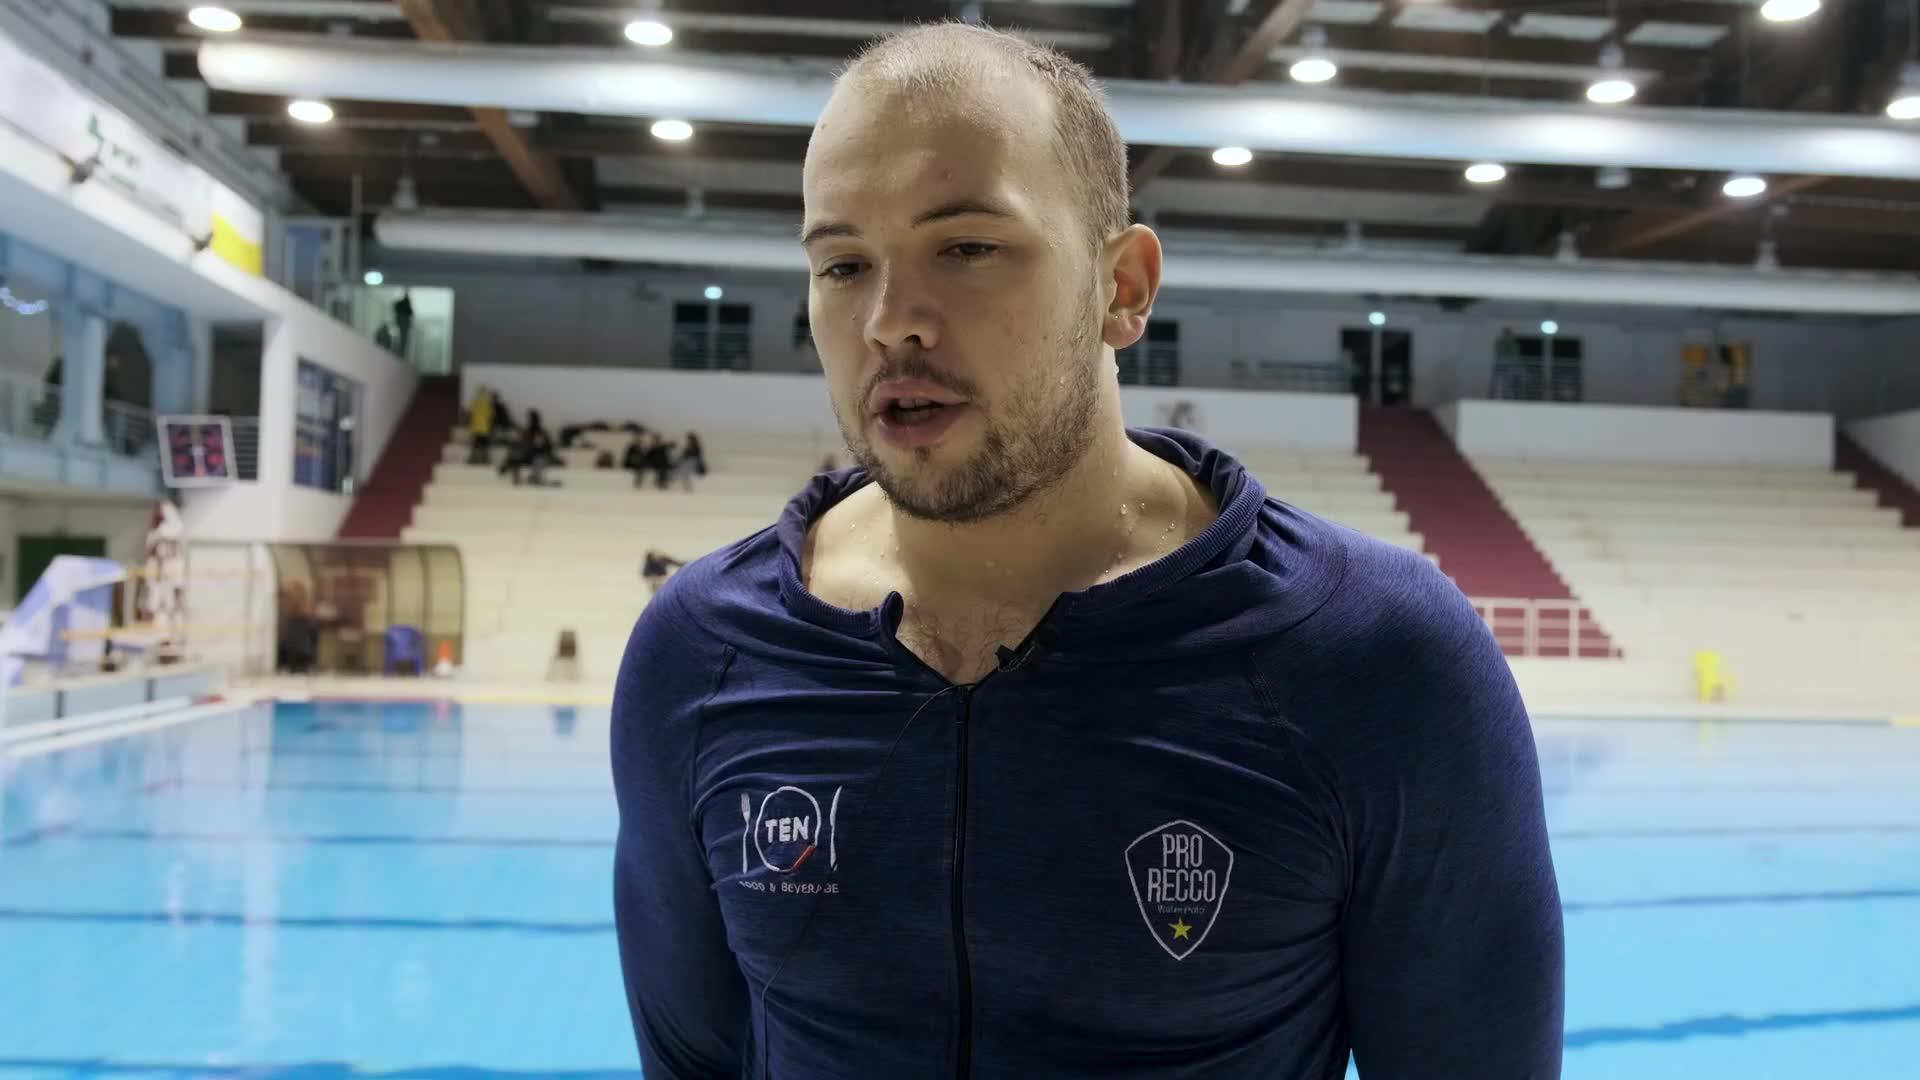 La Pro Recco affronta la Dinamo Tbilisi: le parole di Dušan Mandić